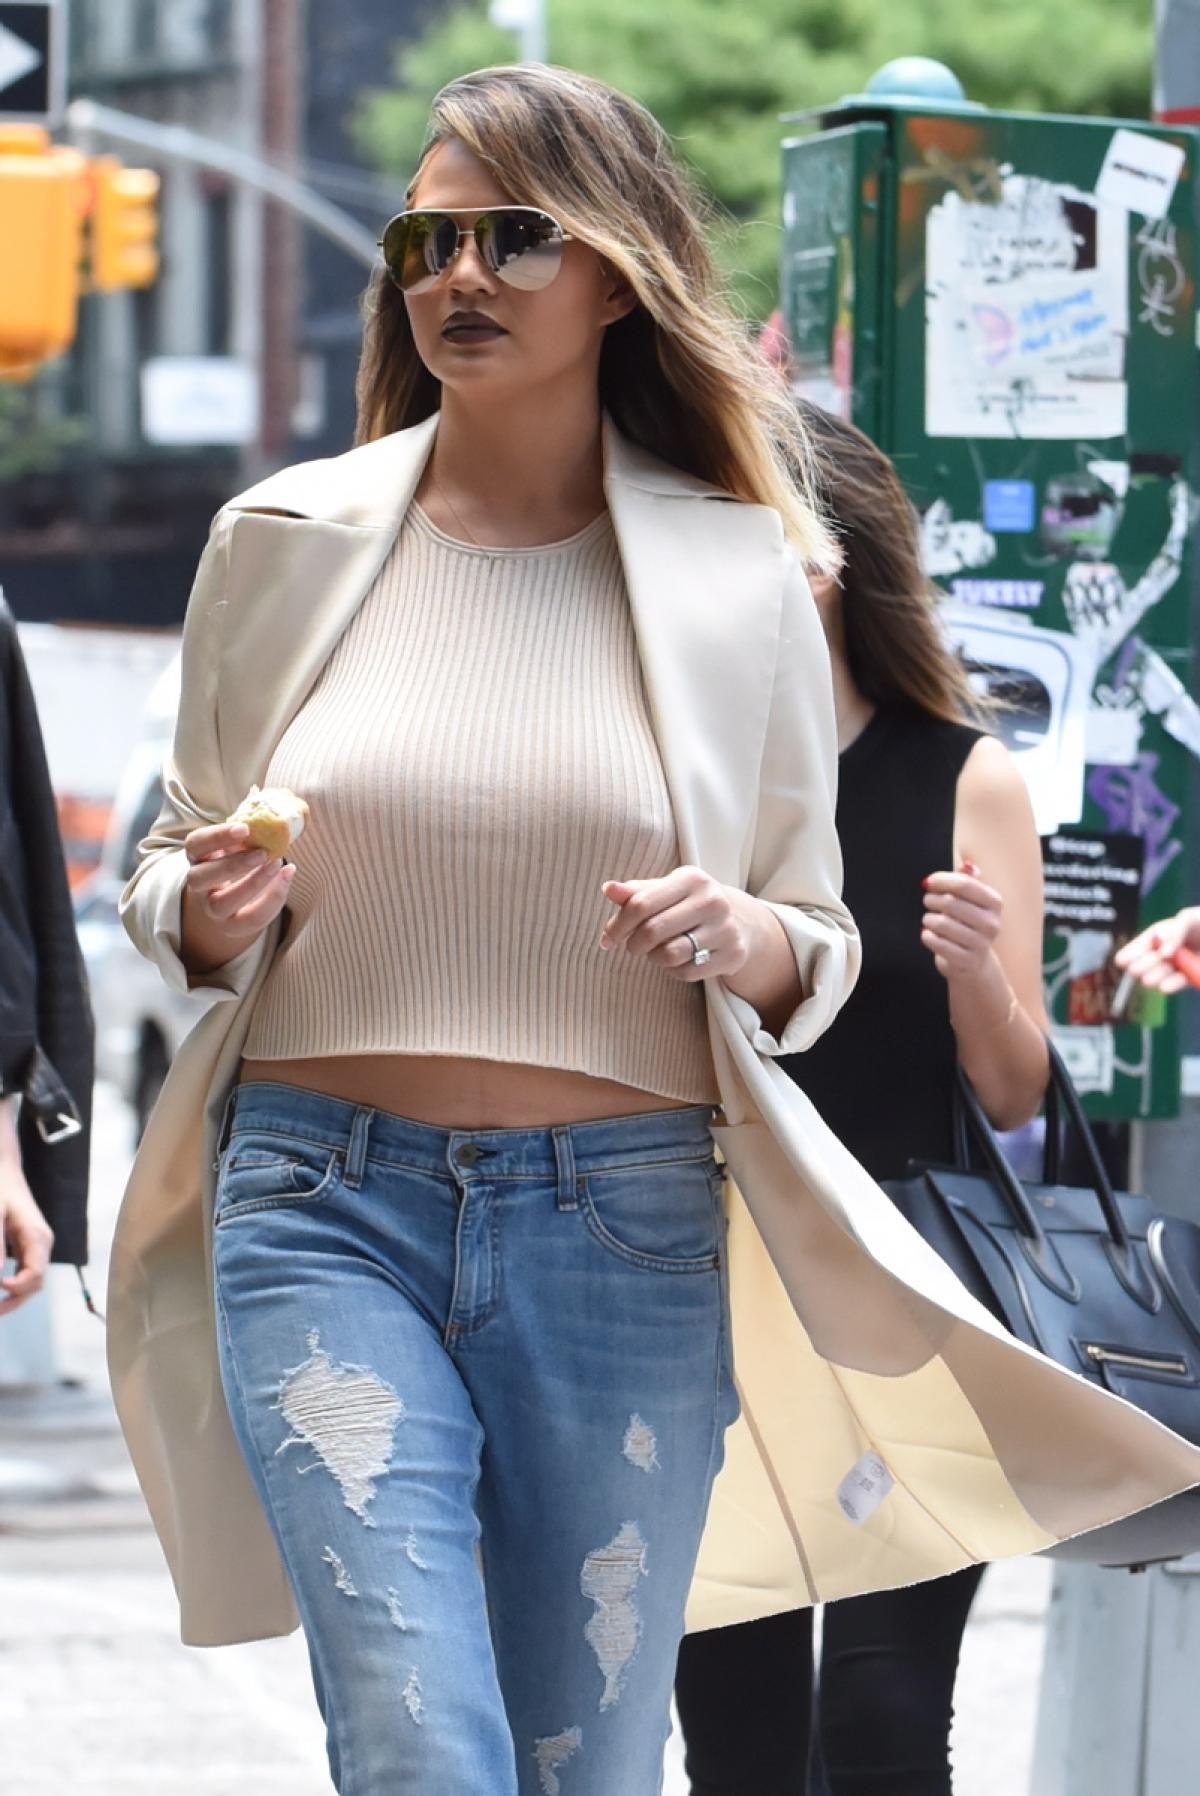 chrissy teigen - photos - celebrities going braless | celebrity